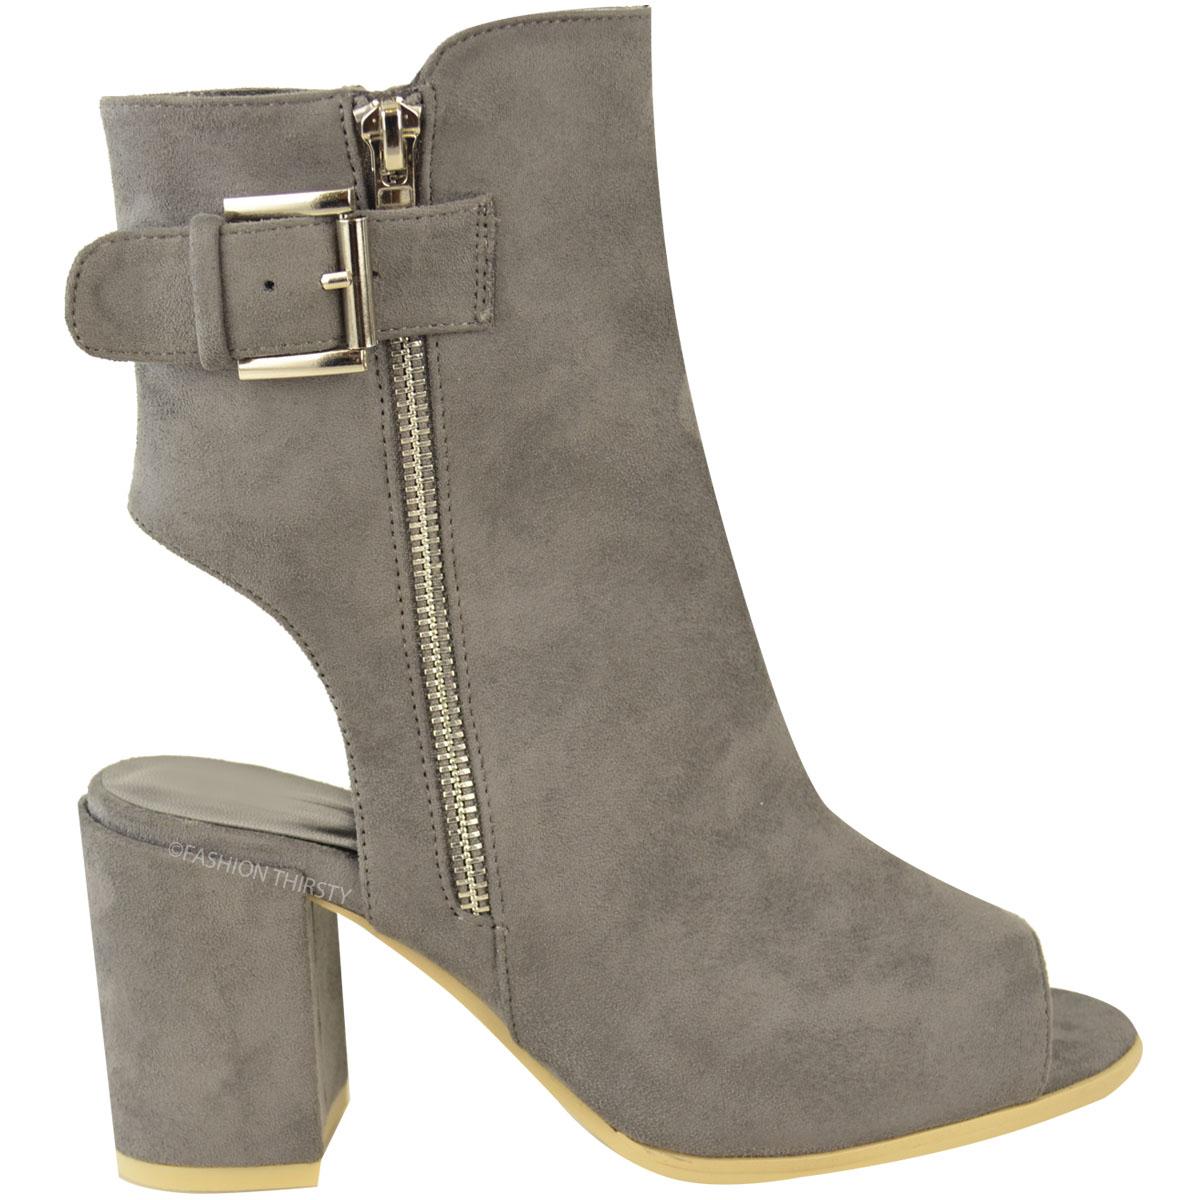 womens ankle boots mid block heel peep toe open